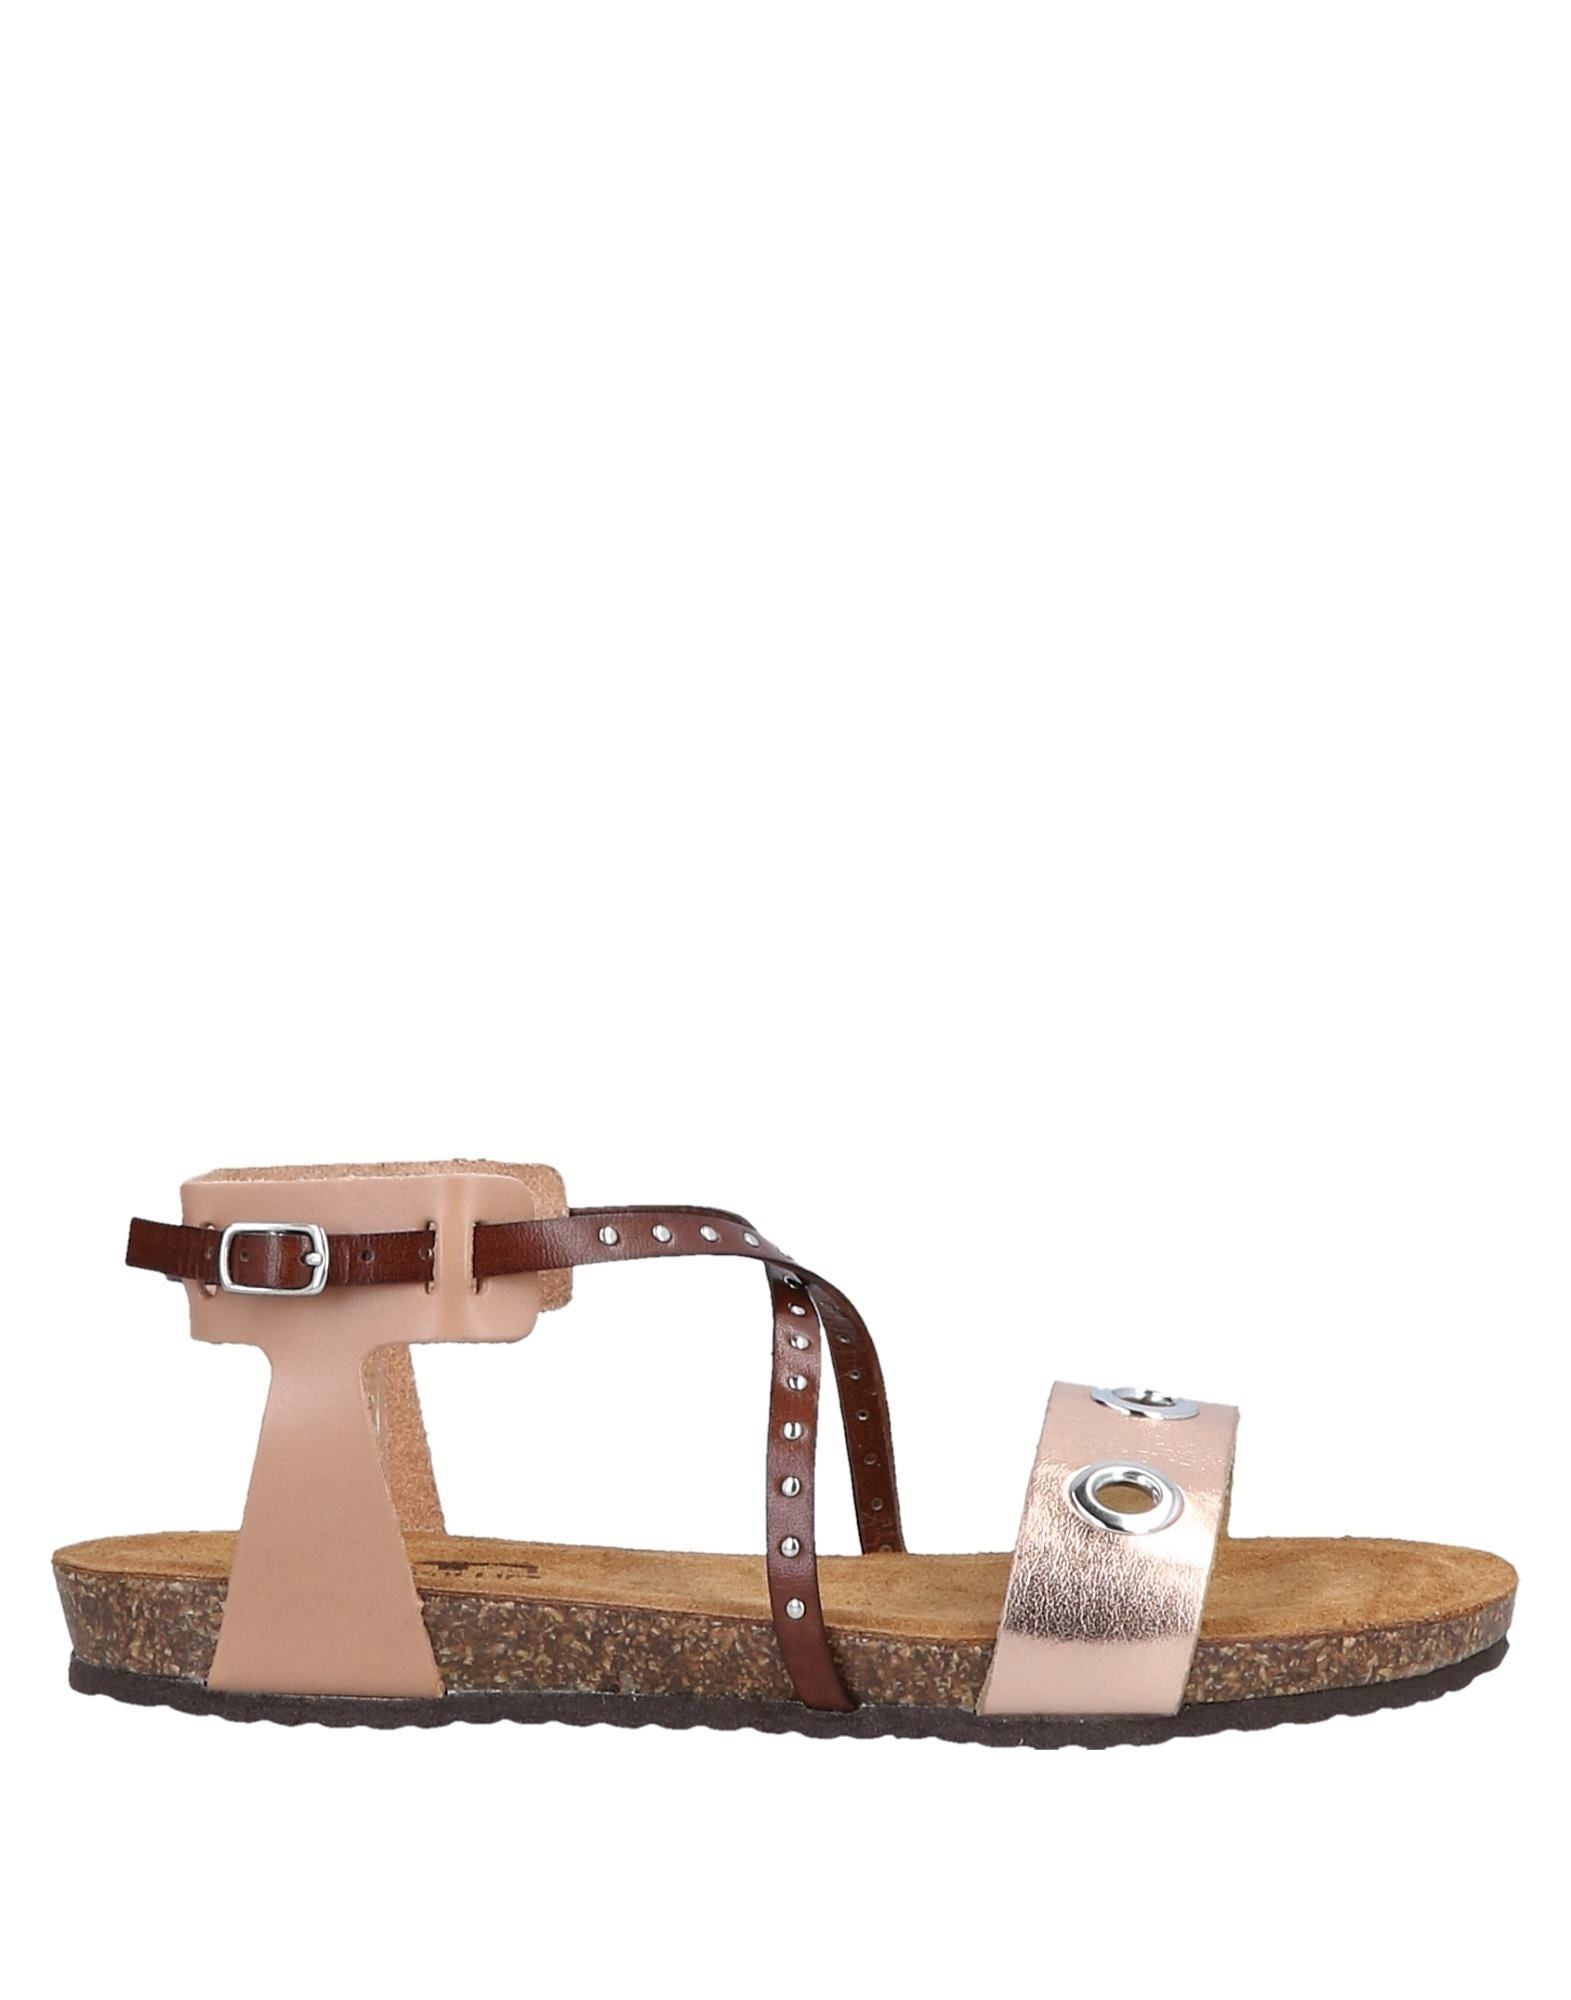 Divine Follie Copper Leather Sandals